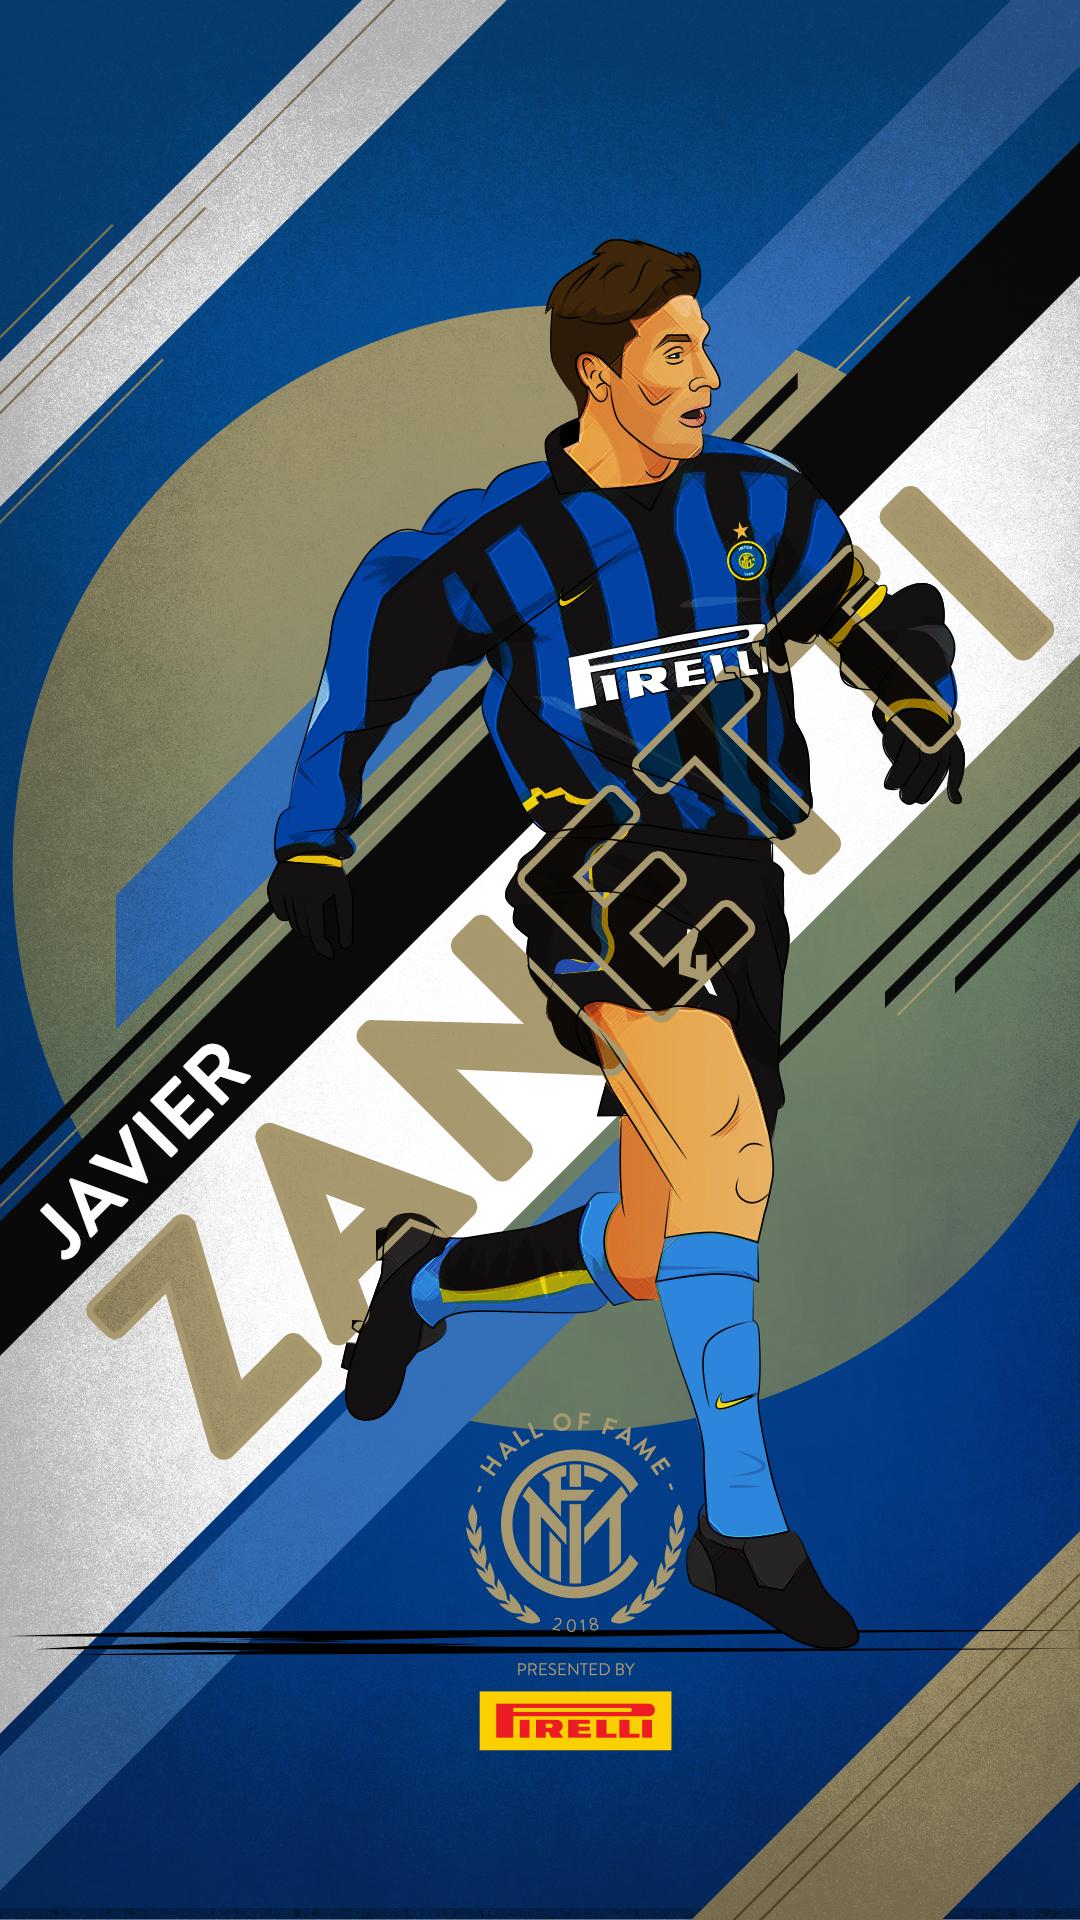 Zanetti_1080x1920_Insta-Story.jpg